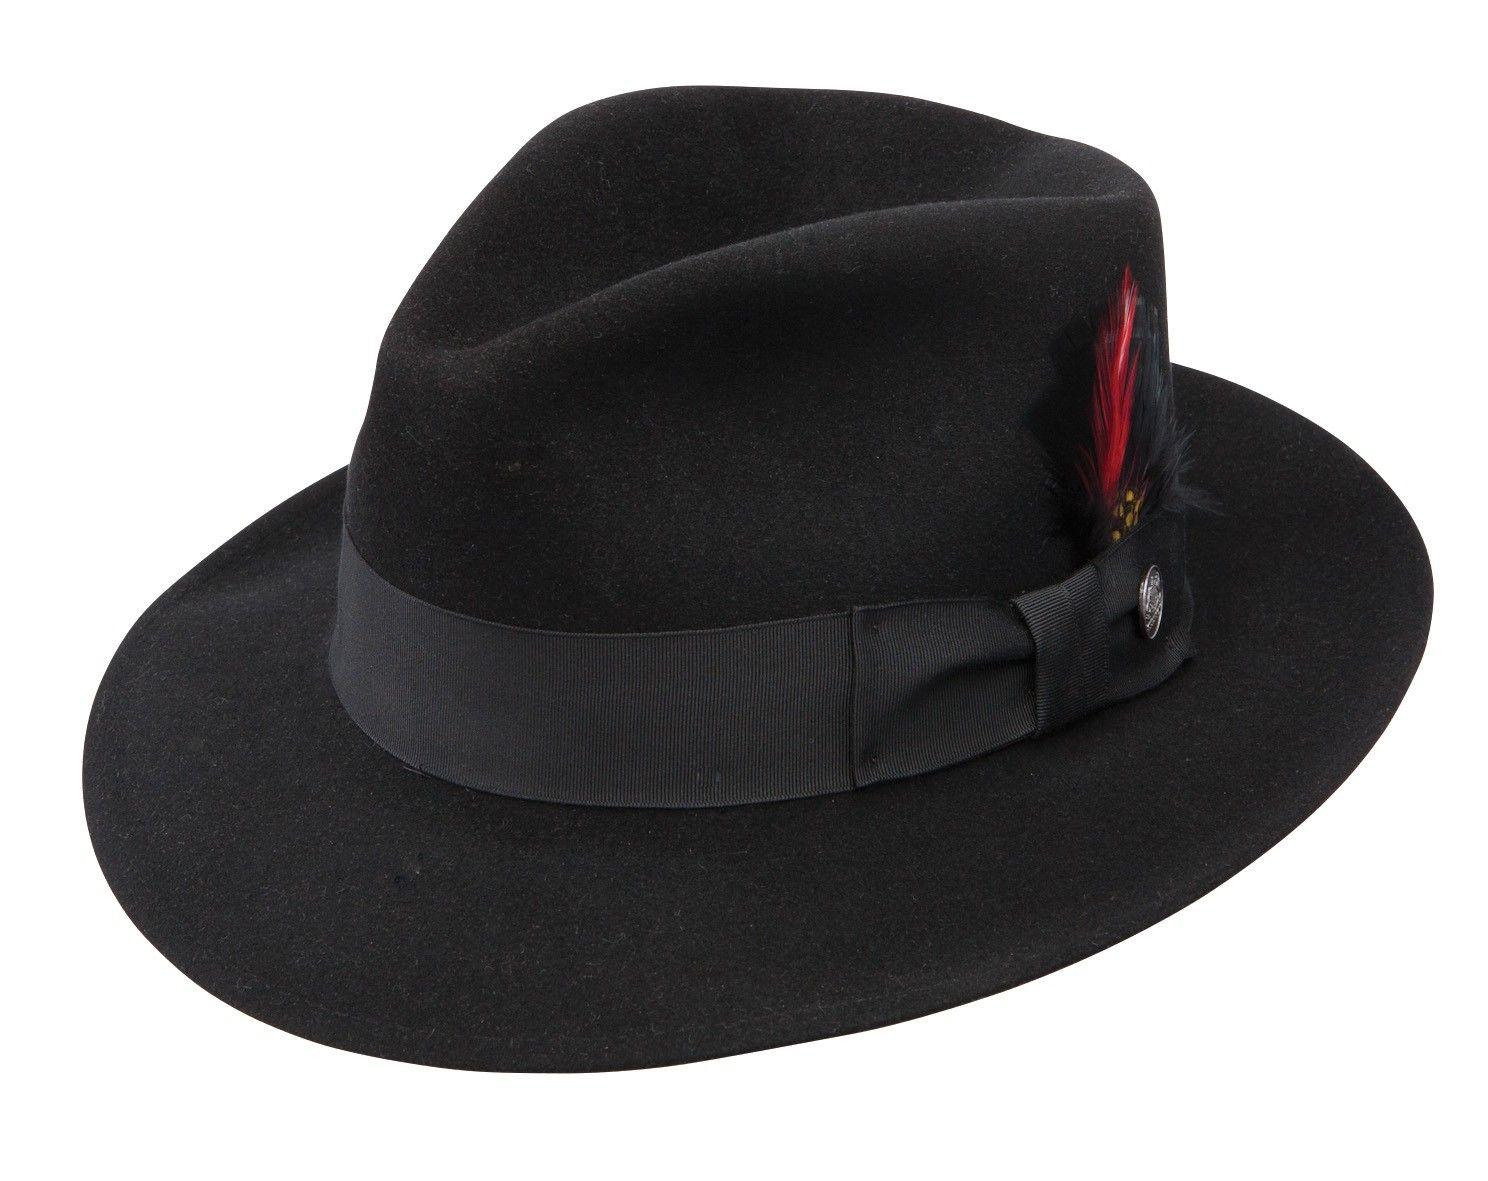 3b1a3d125bd759 Stetson Eagle Fur Felt Fedora   Scandalous Brims. ;)   Mens felt hat ...